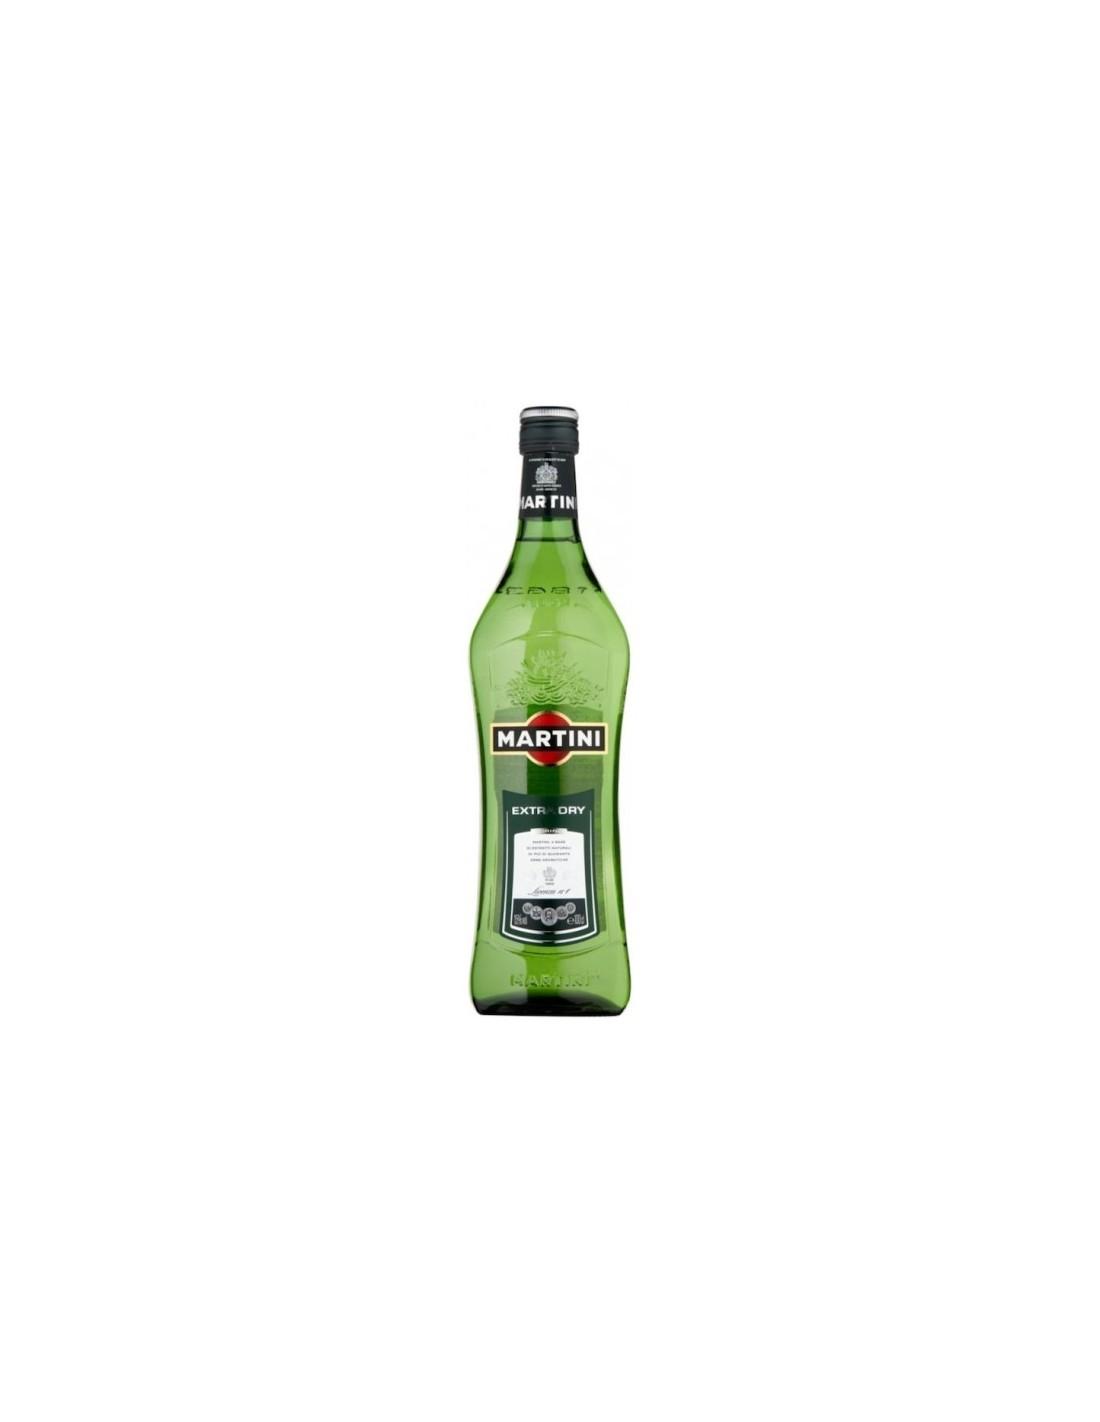 Aperitiv Martini extra dry, 15% alc., 1L, Italia